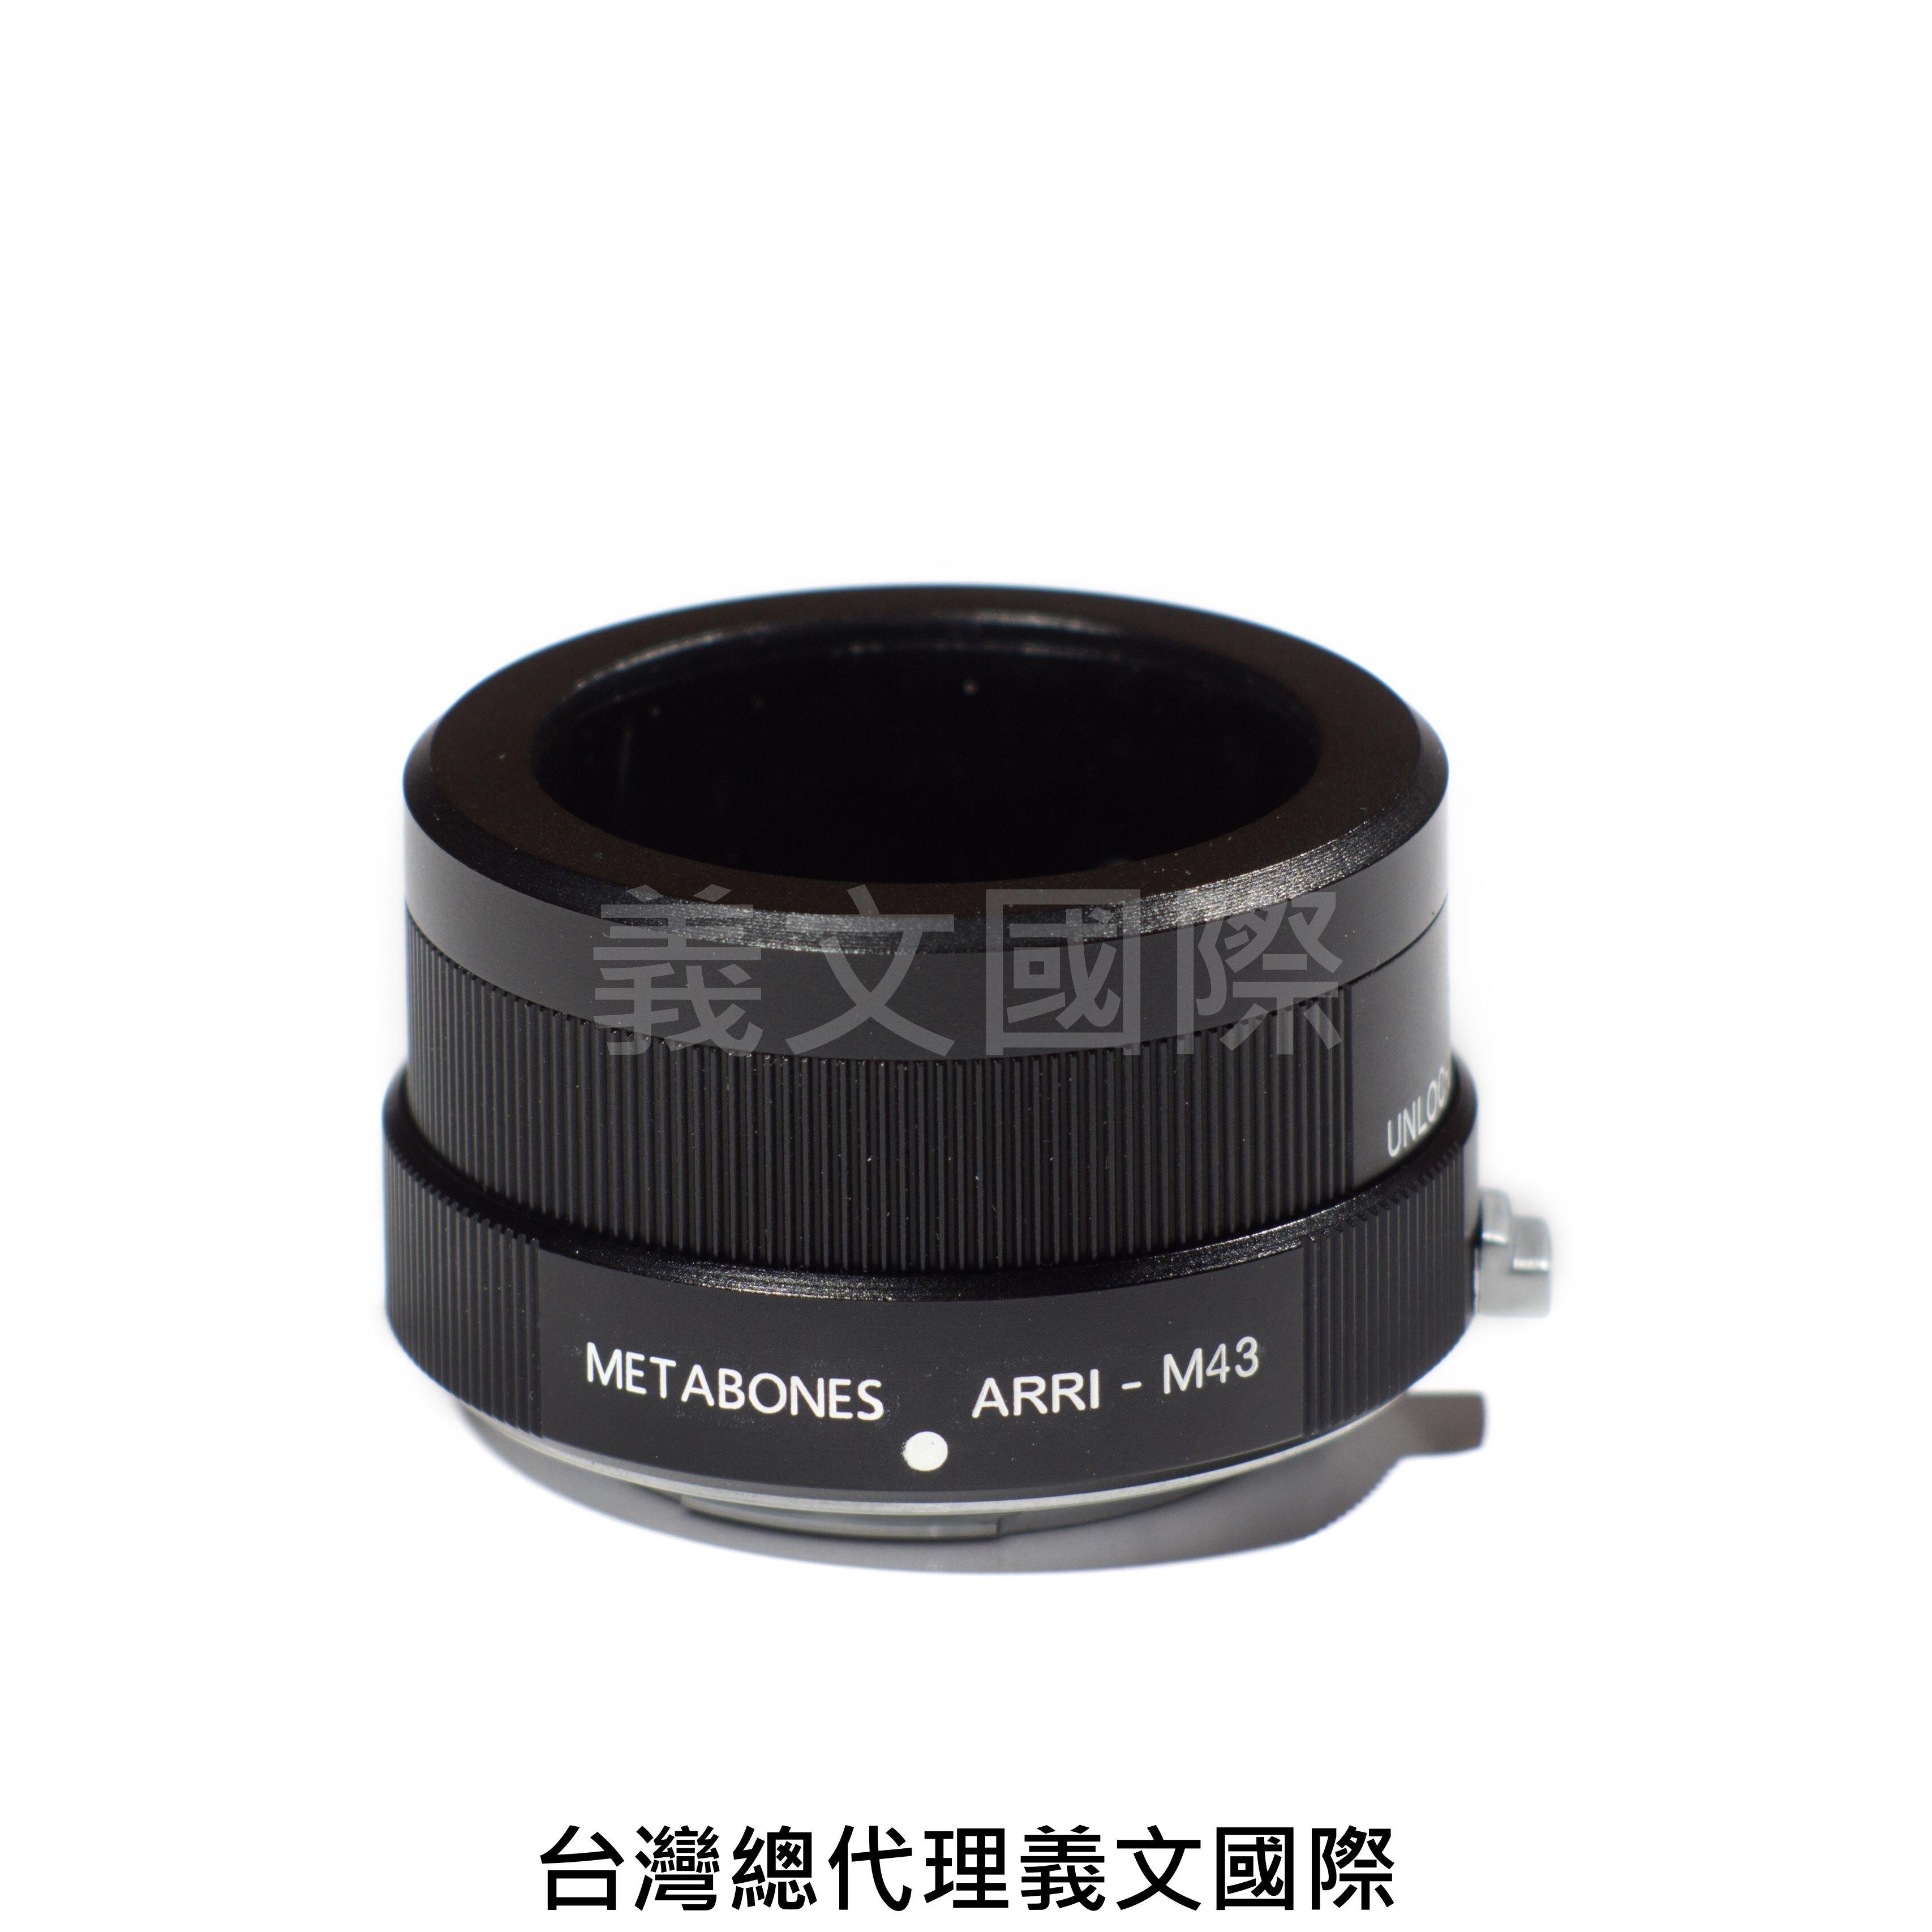 Metabones專賣店:Arriflex-M4/3(Panasonic,Micro 43,Olympus,GH5,GH4,G8,GF10,EM1,EM5,轉接環)